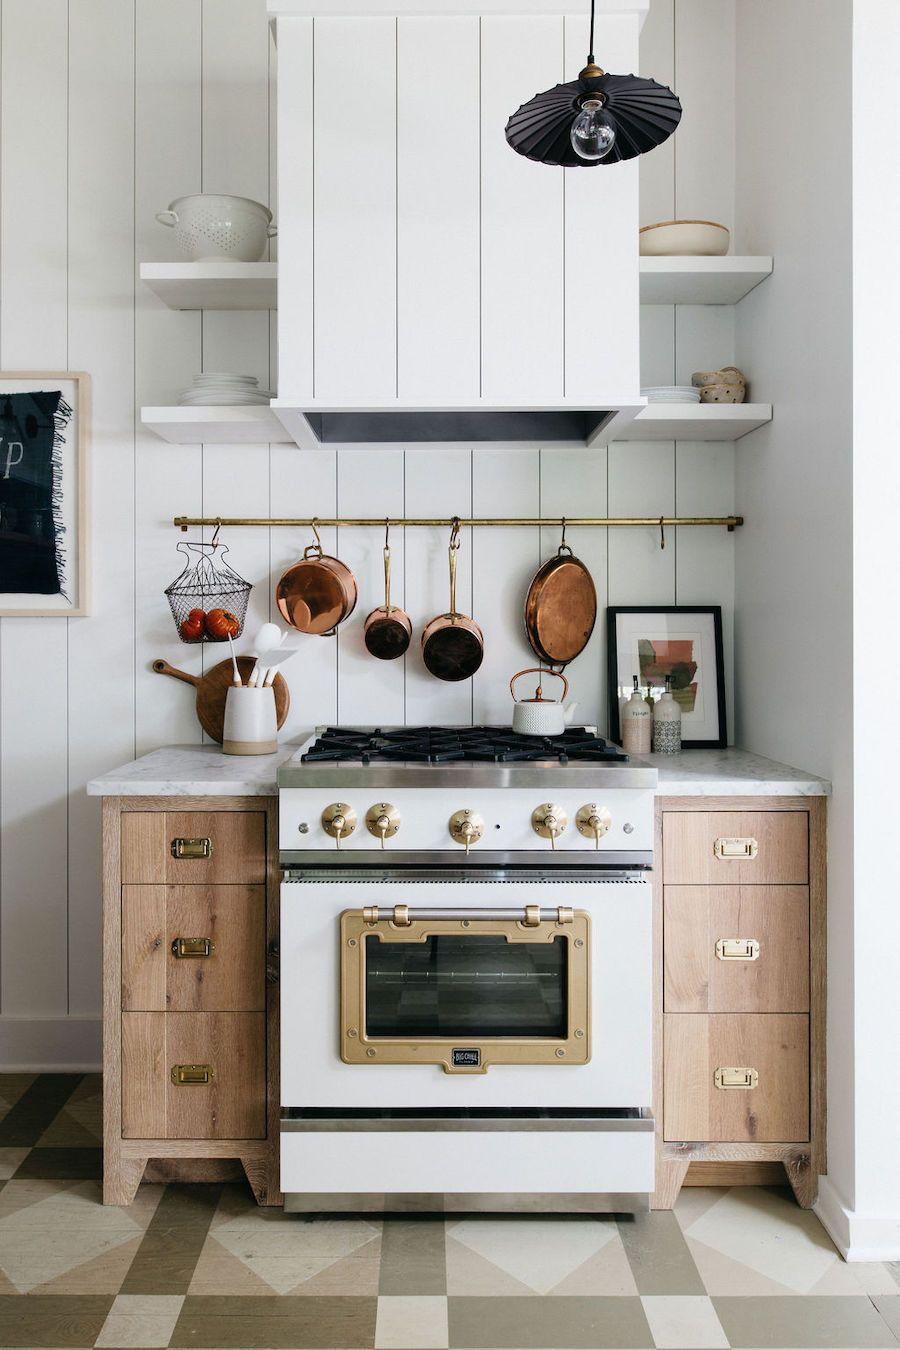 10 Stunning Vacation Rentals To Book Now Natural Wood White Cottage Kitchen The Identite Collective Kitchen Remodel White Cottage Kitchens Kitchen Design